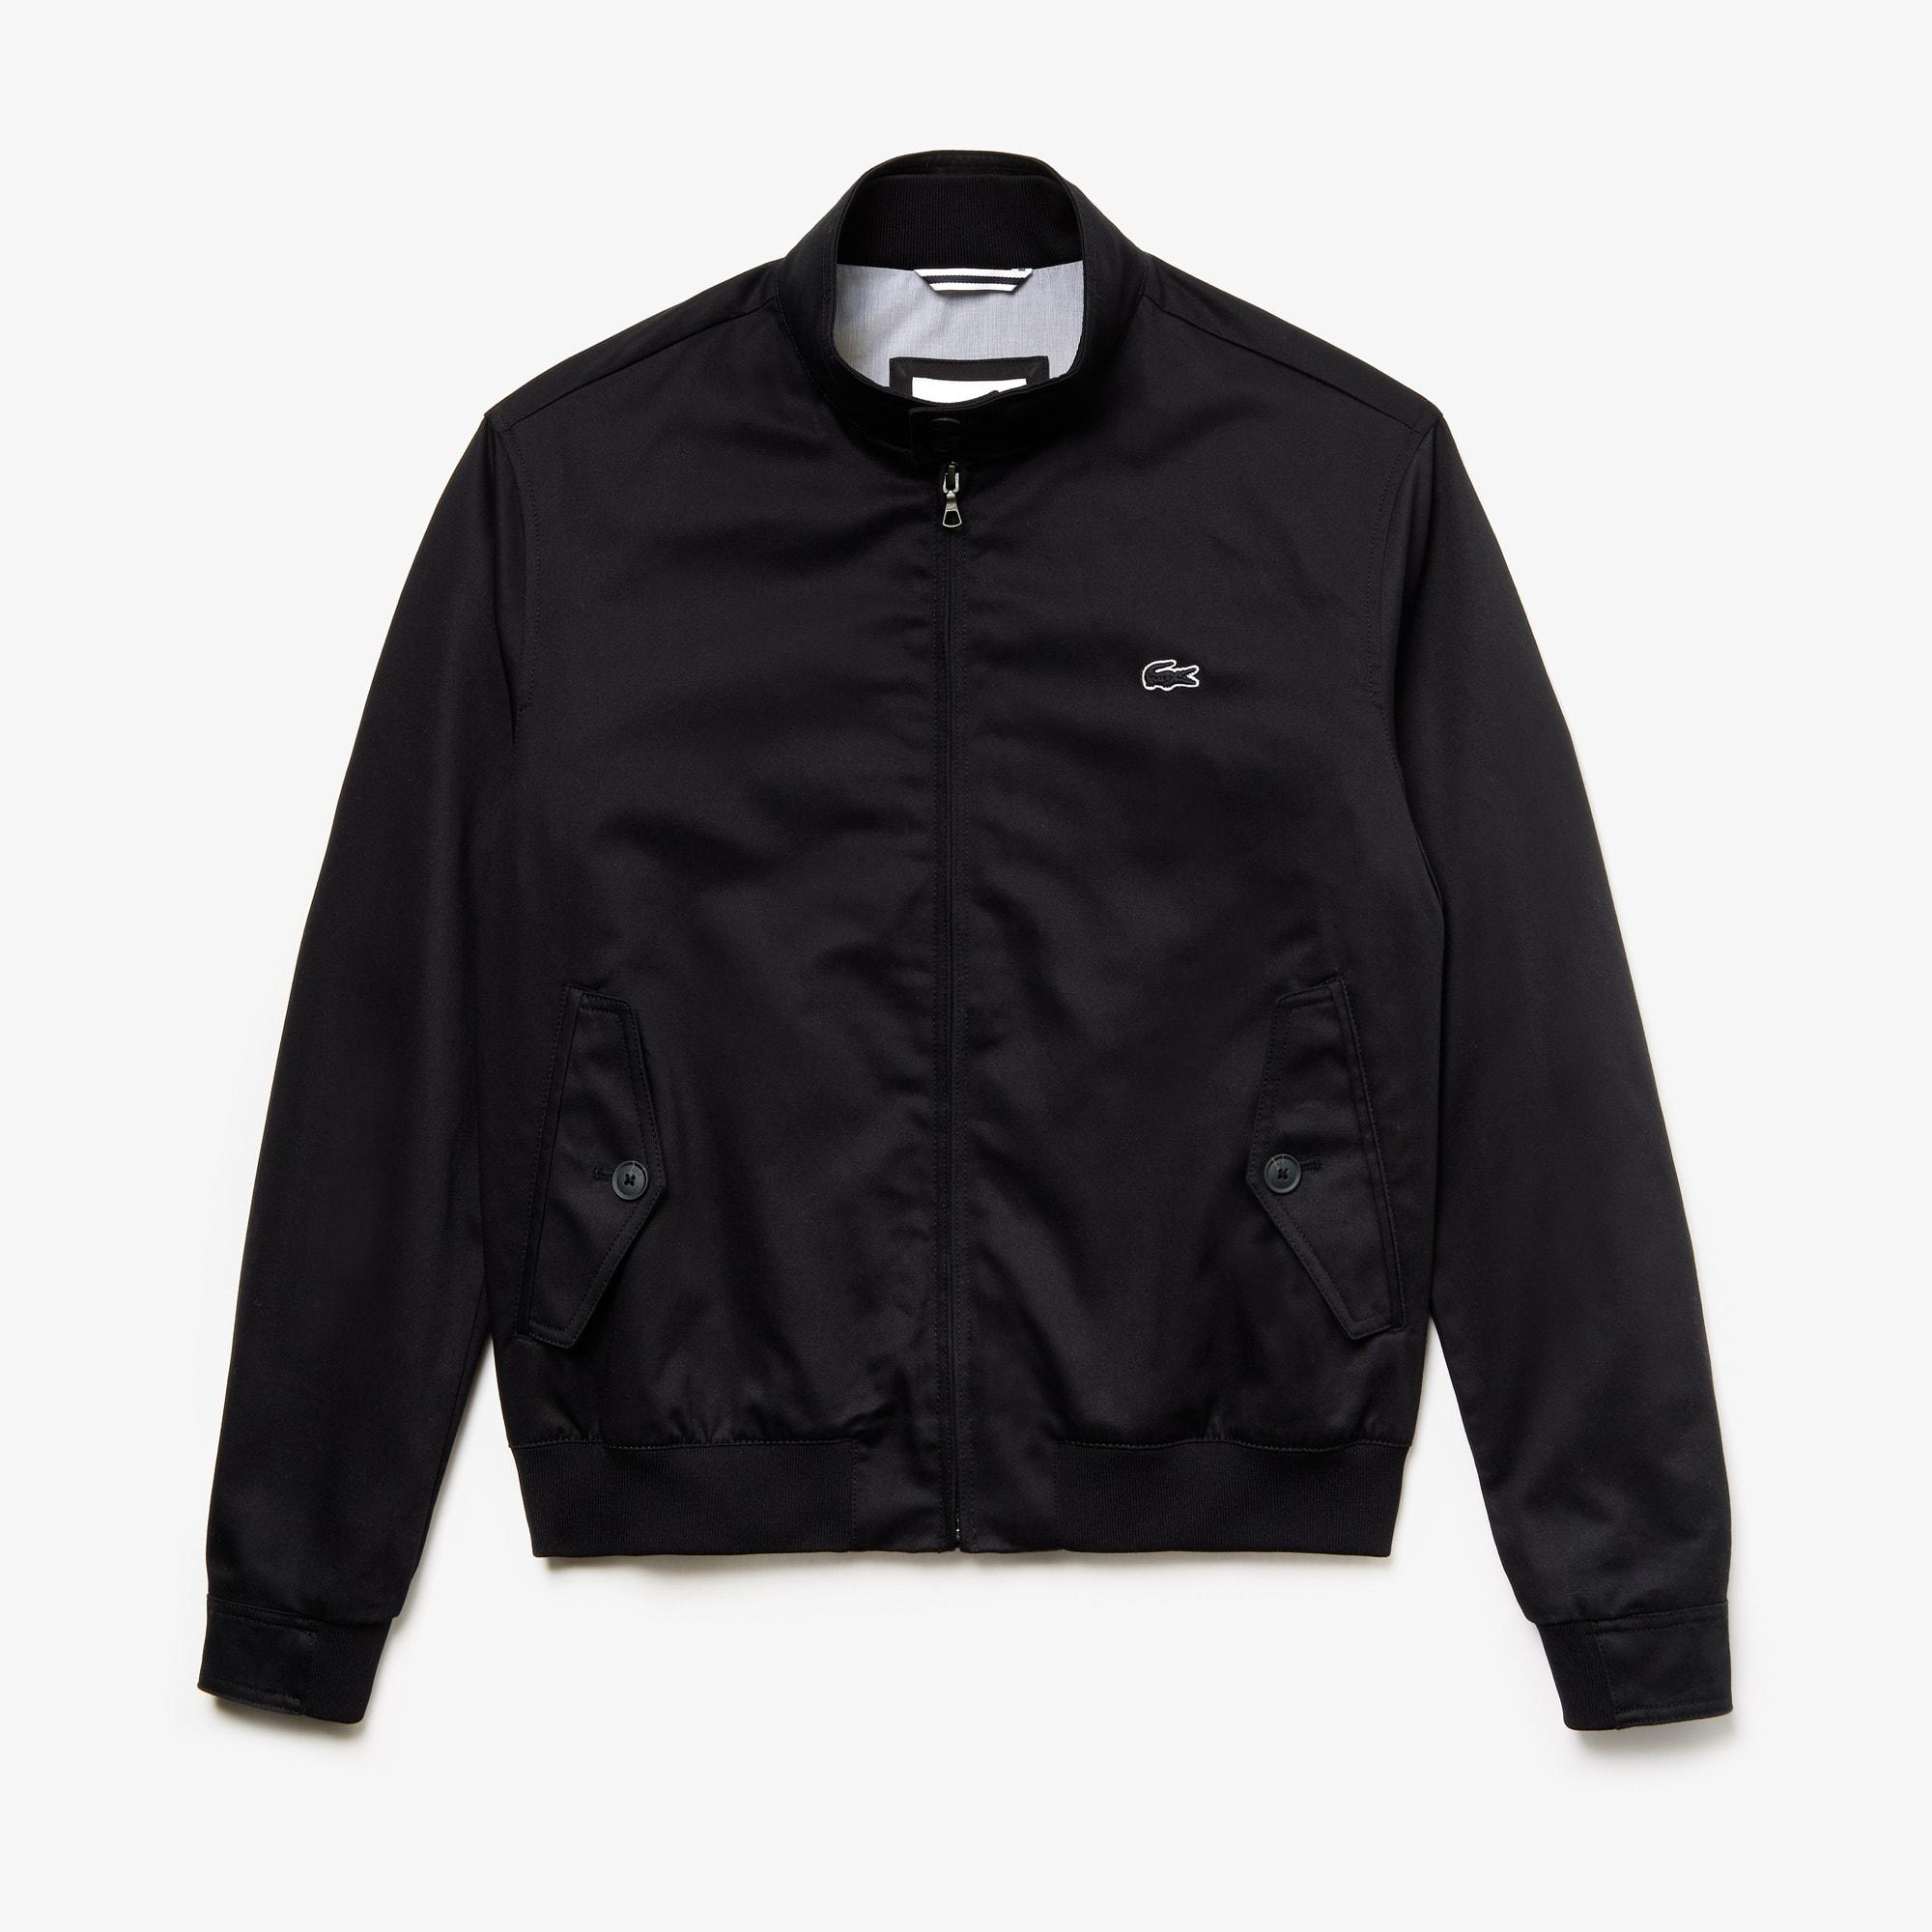 Men's Short Zip Cotton Twill Jacket